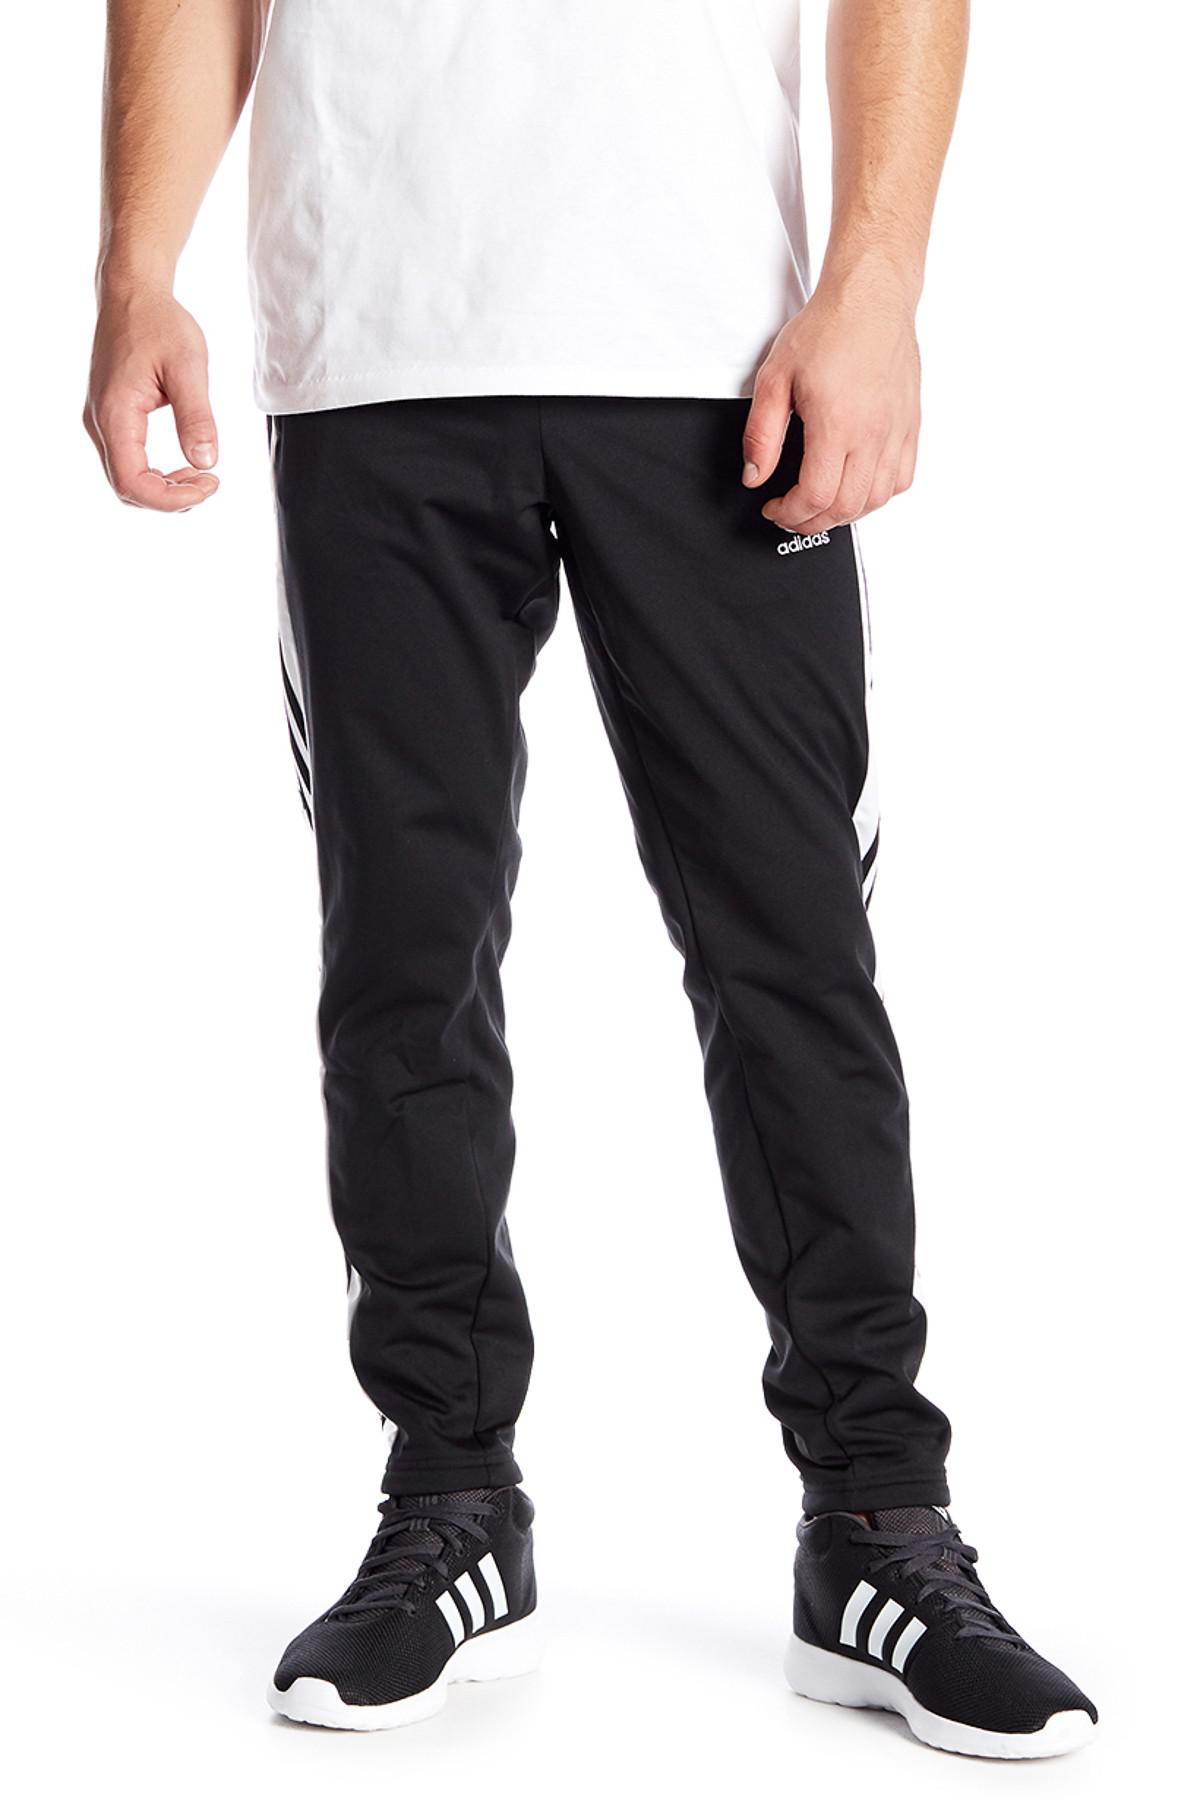 Lyst adidas Originals adibreak Tapered para pista pantalones en negro para Tapered hombres d0acbe